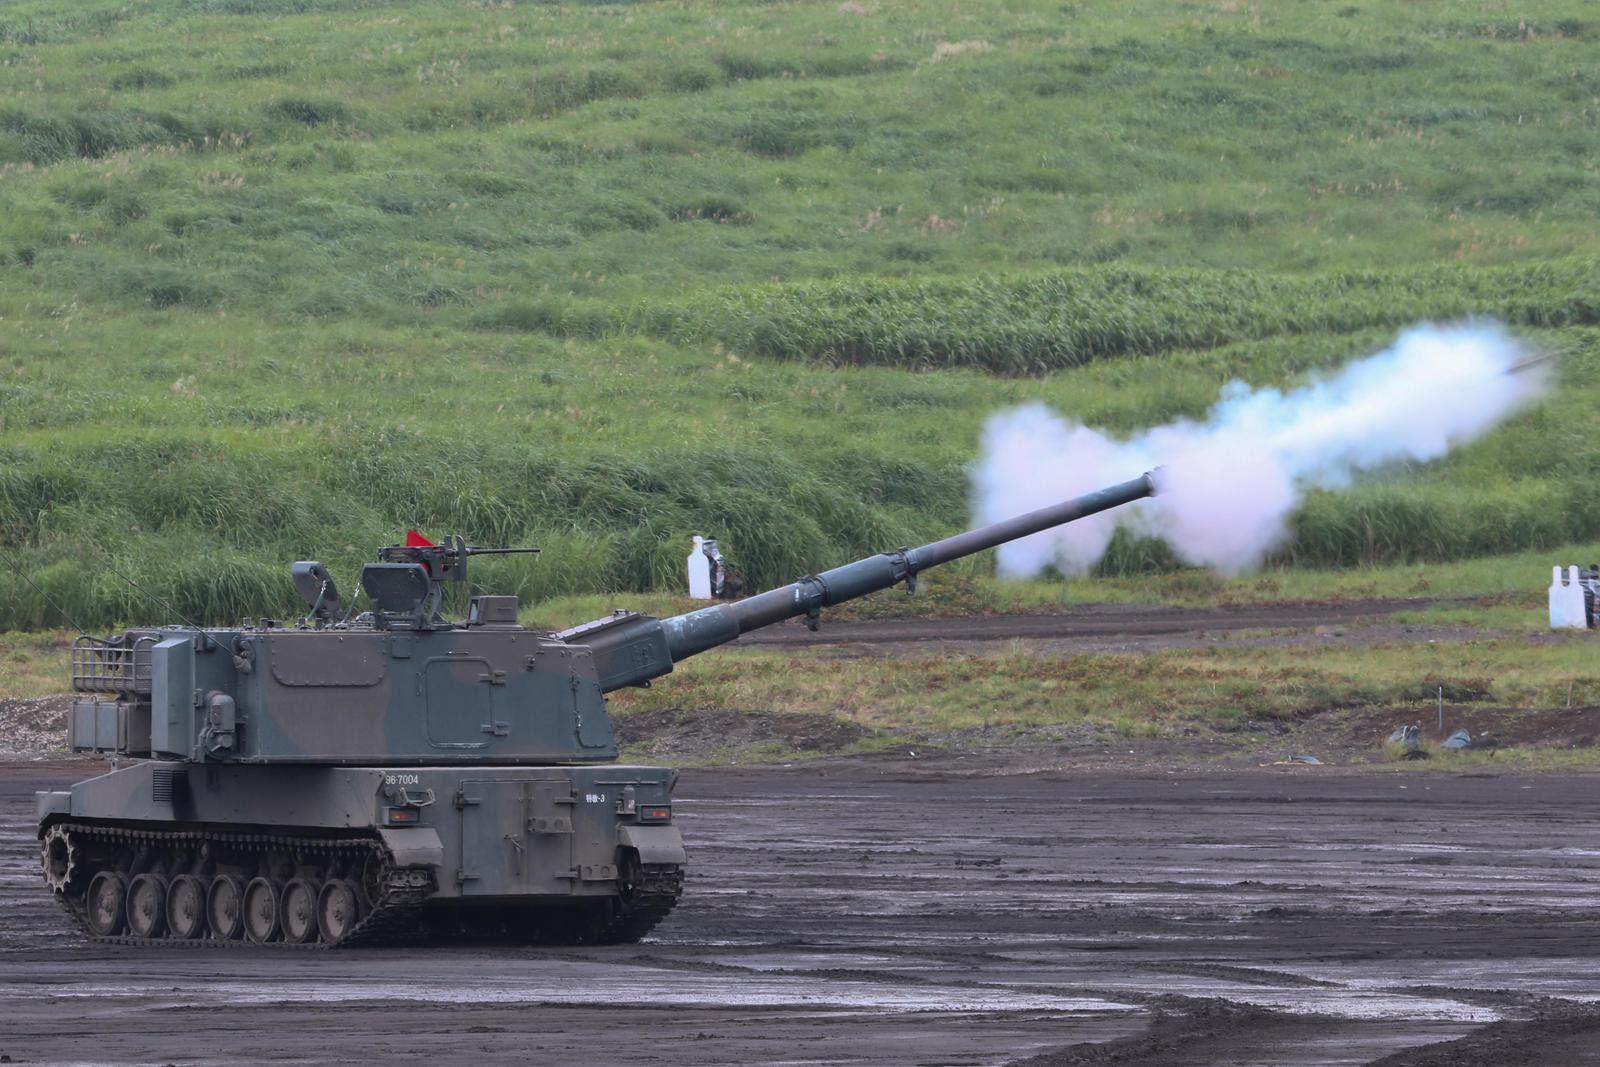 http://img13.deviantart.net/5057/i/2015/022/d/6/type_99_155_mm_self_propelled_howitzer_by_ddmurasame-d8ex2dy.jpg